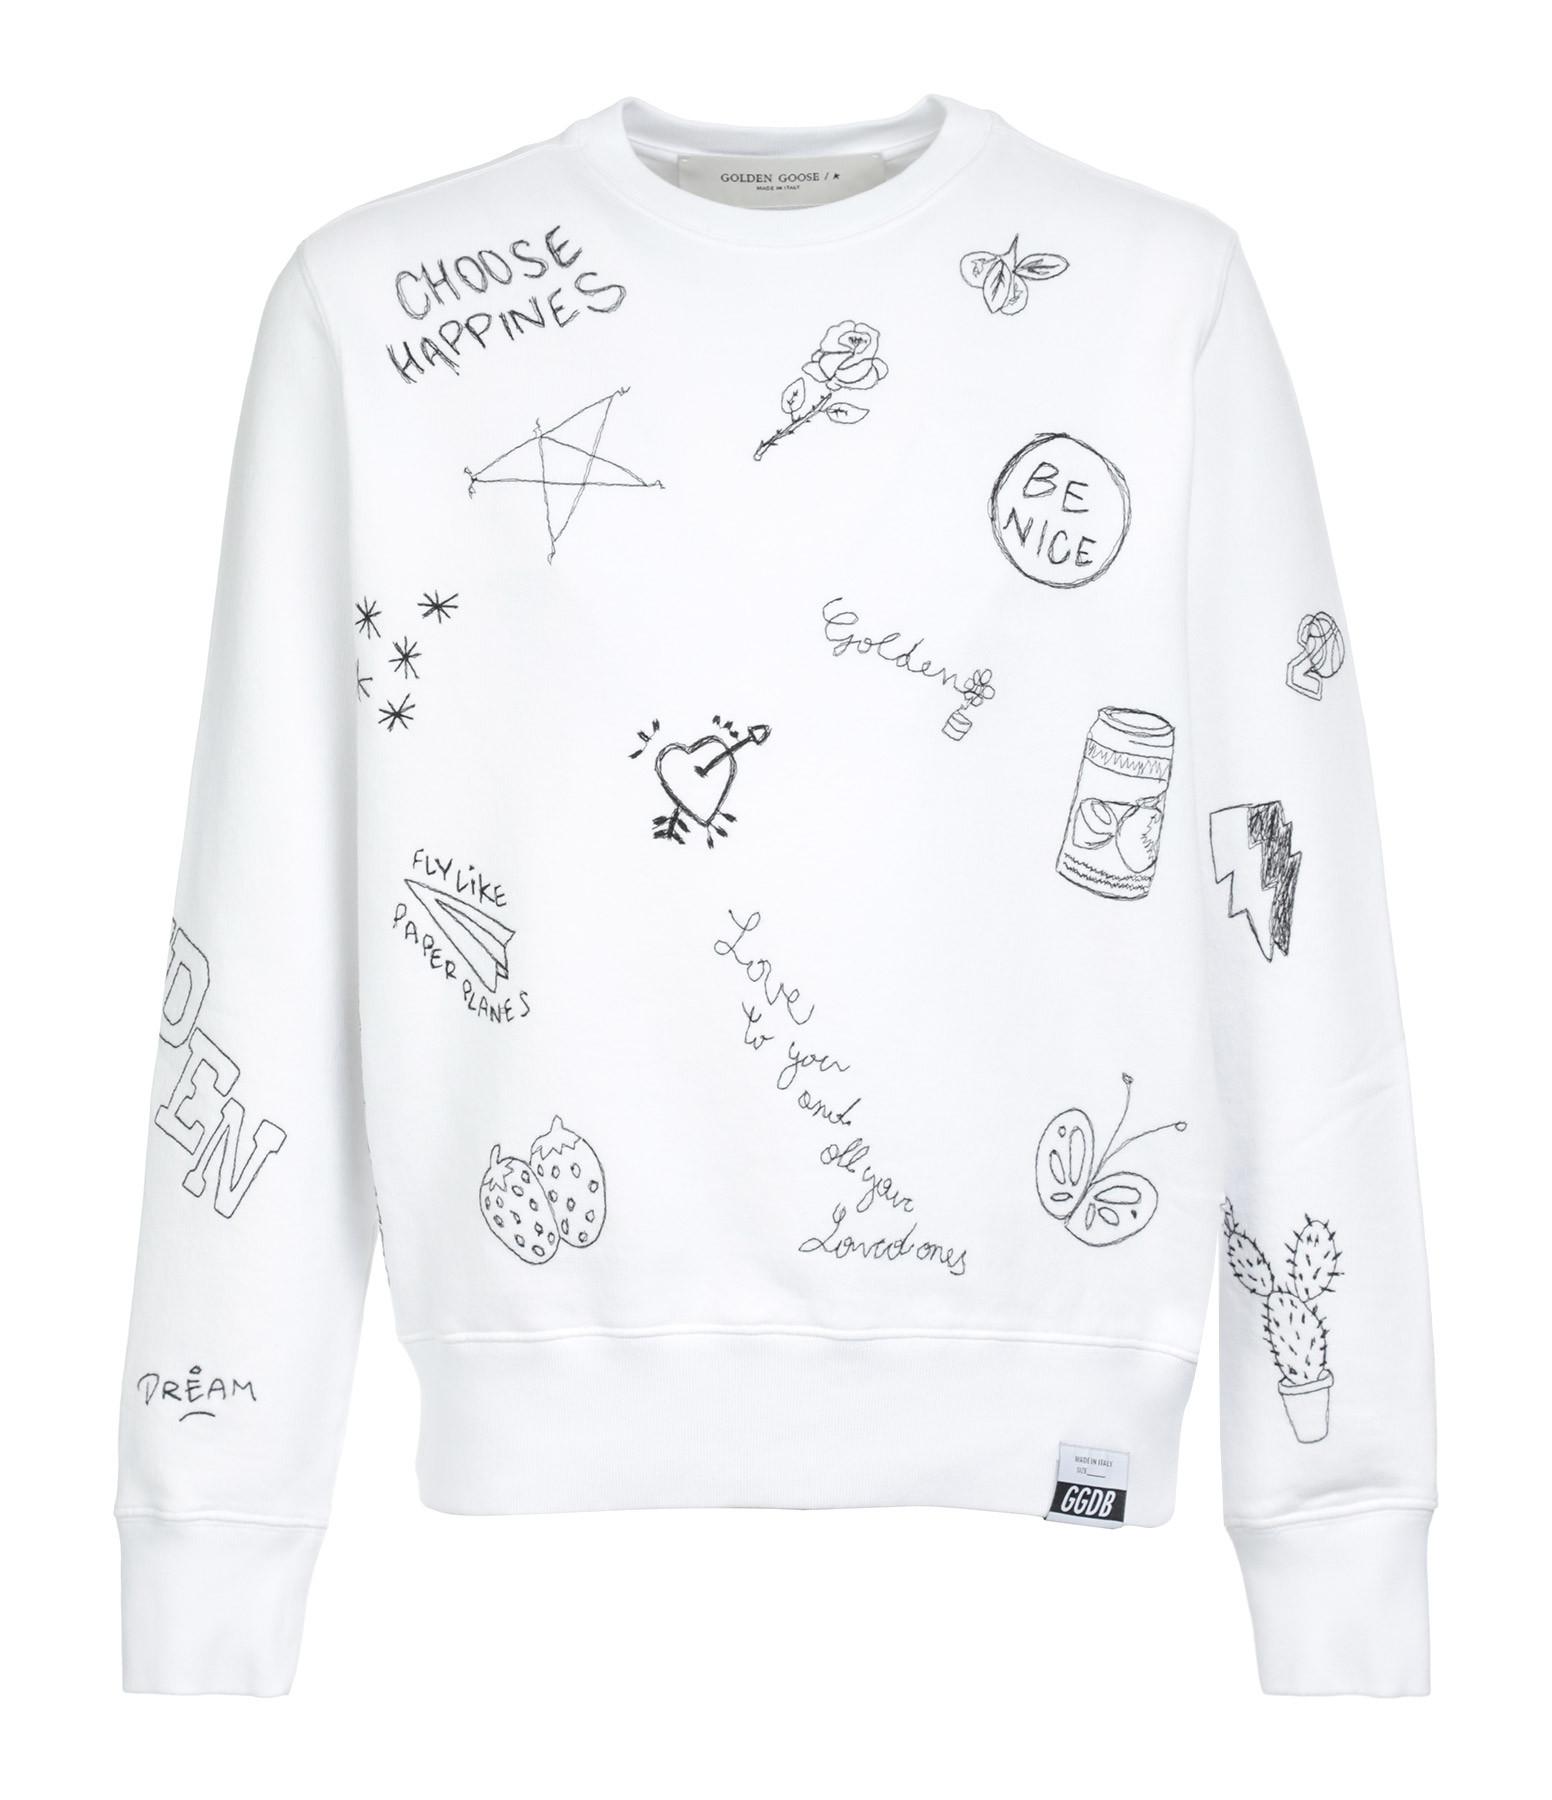 GOLDEN GOOSE - Sweatshirt Athena Broderie Coton Blanc